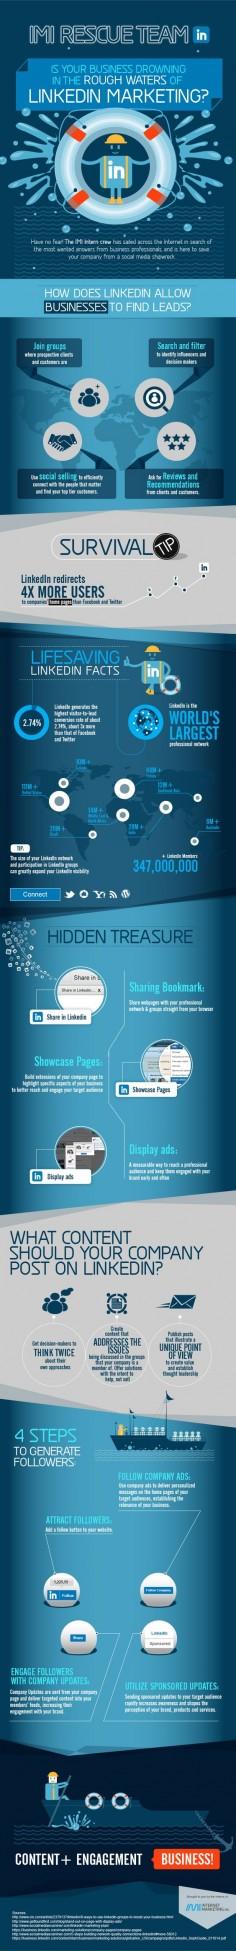 Marketing en Linkedin – Infografia   Infografia - Las mejores infografias de Internet